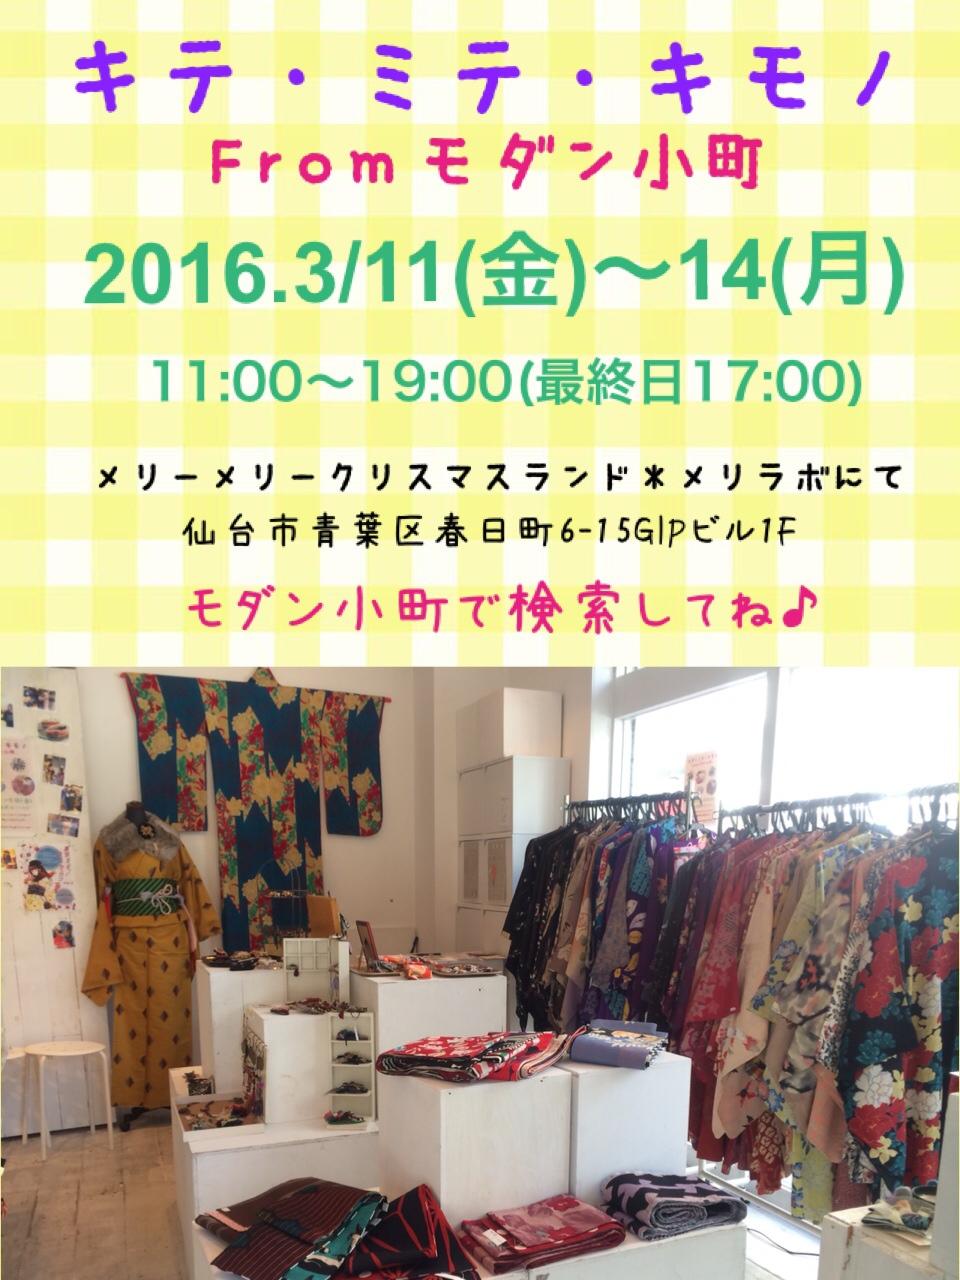 fc2blog_2016021622480278c.jpg